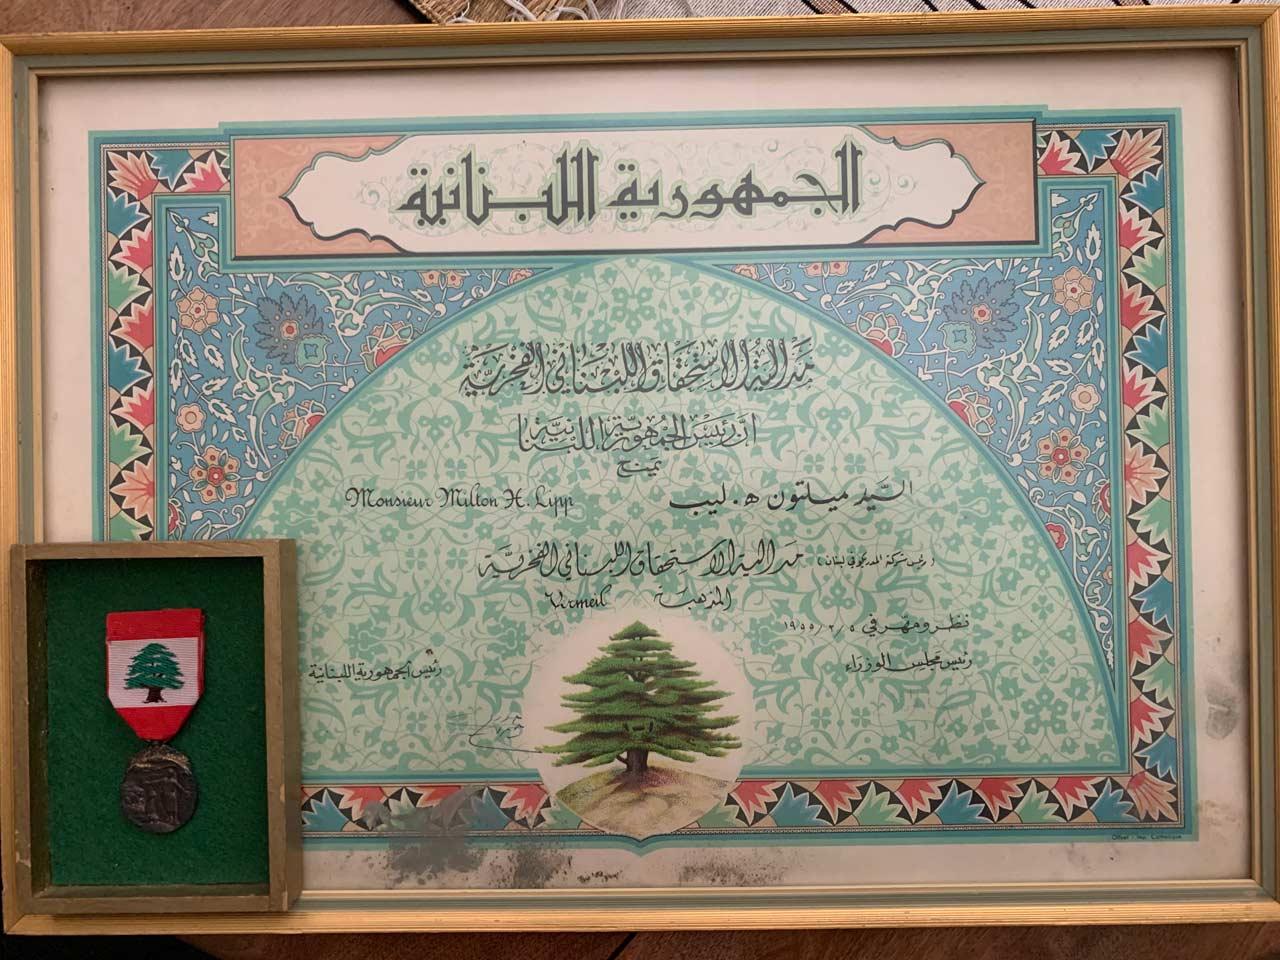 President Chamoun awarded Milton the Lebanese Order of the Cedar during ceremony.